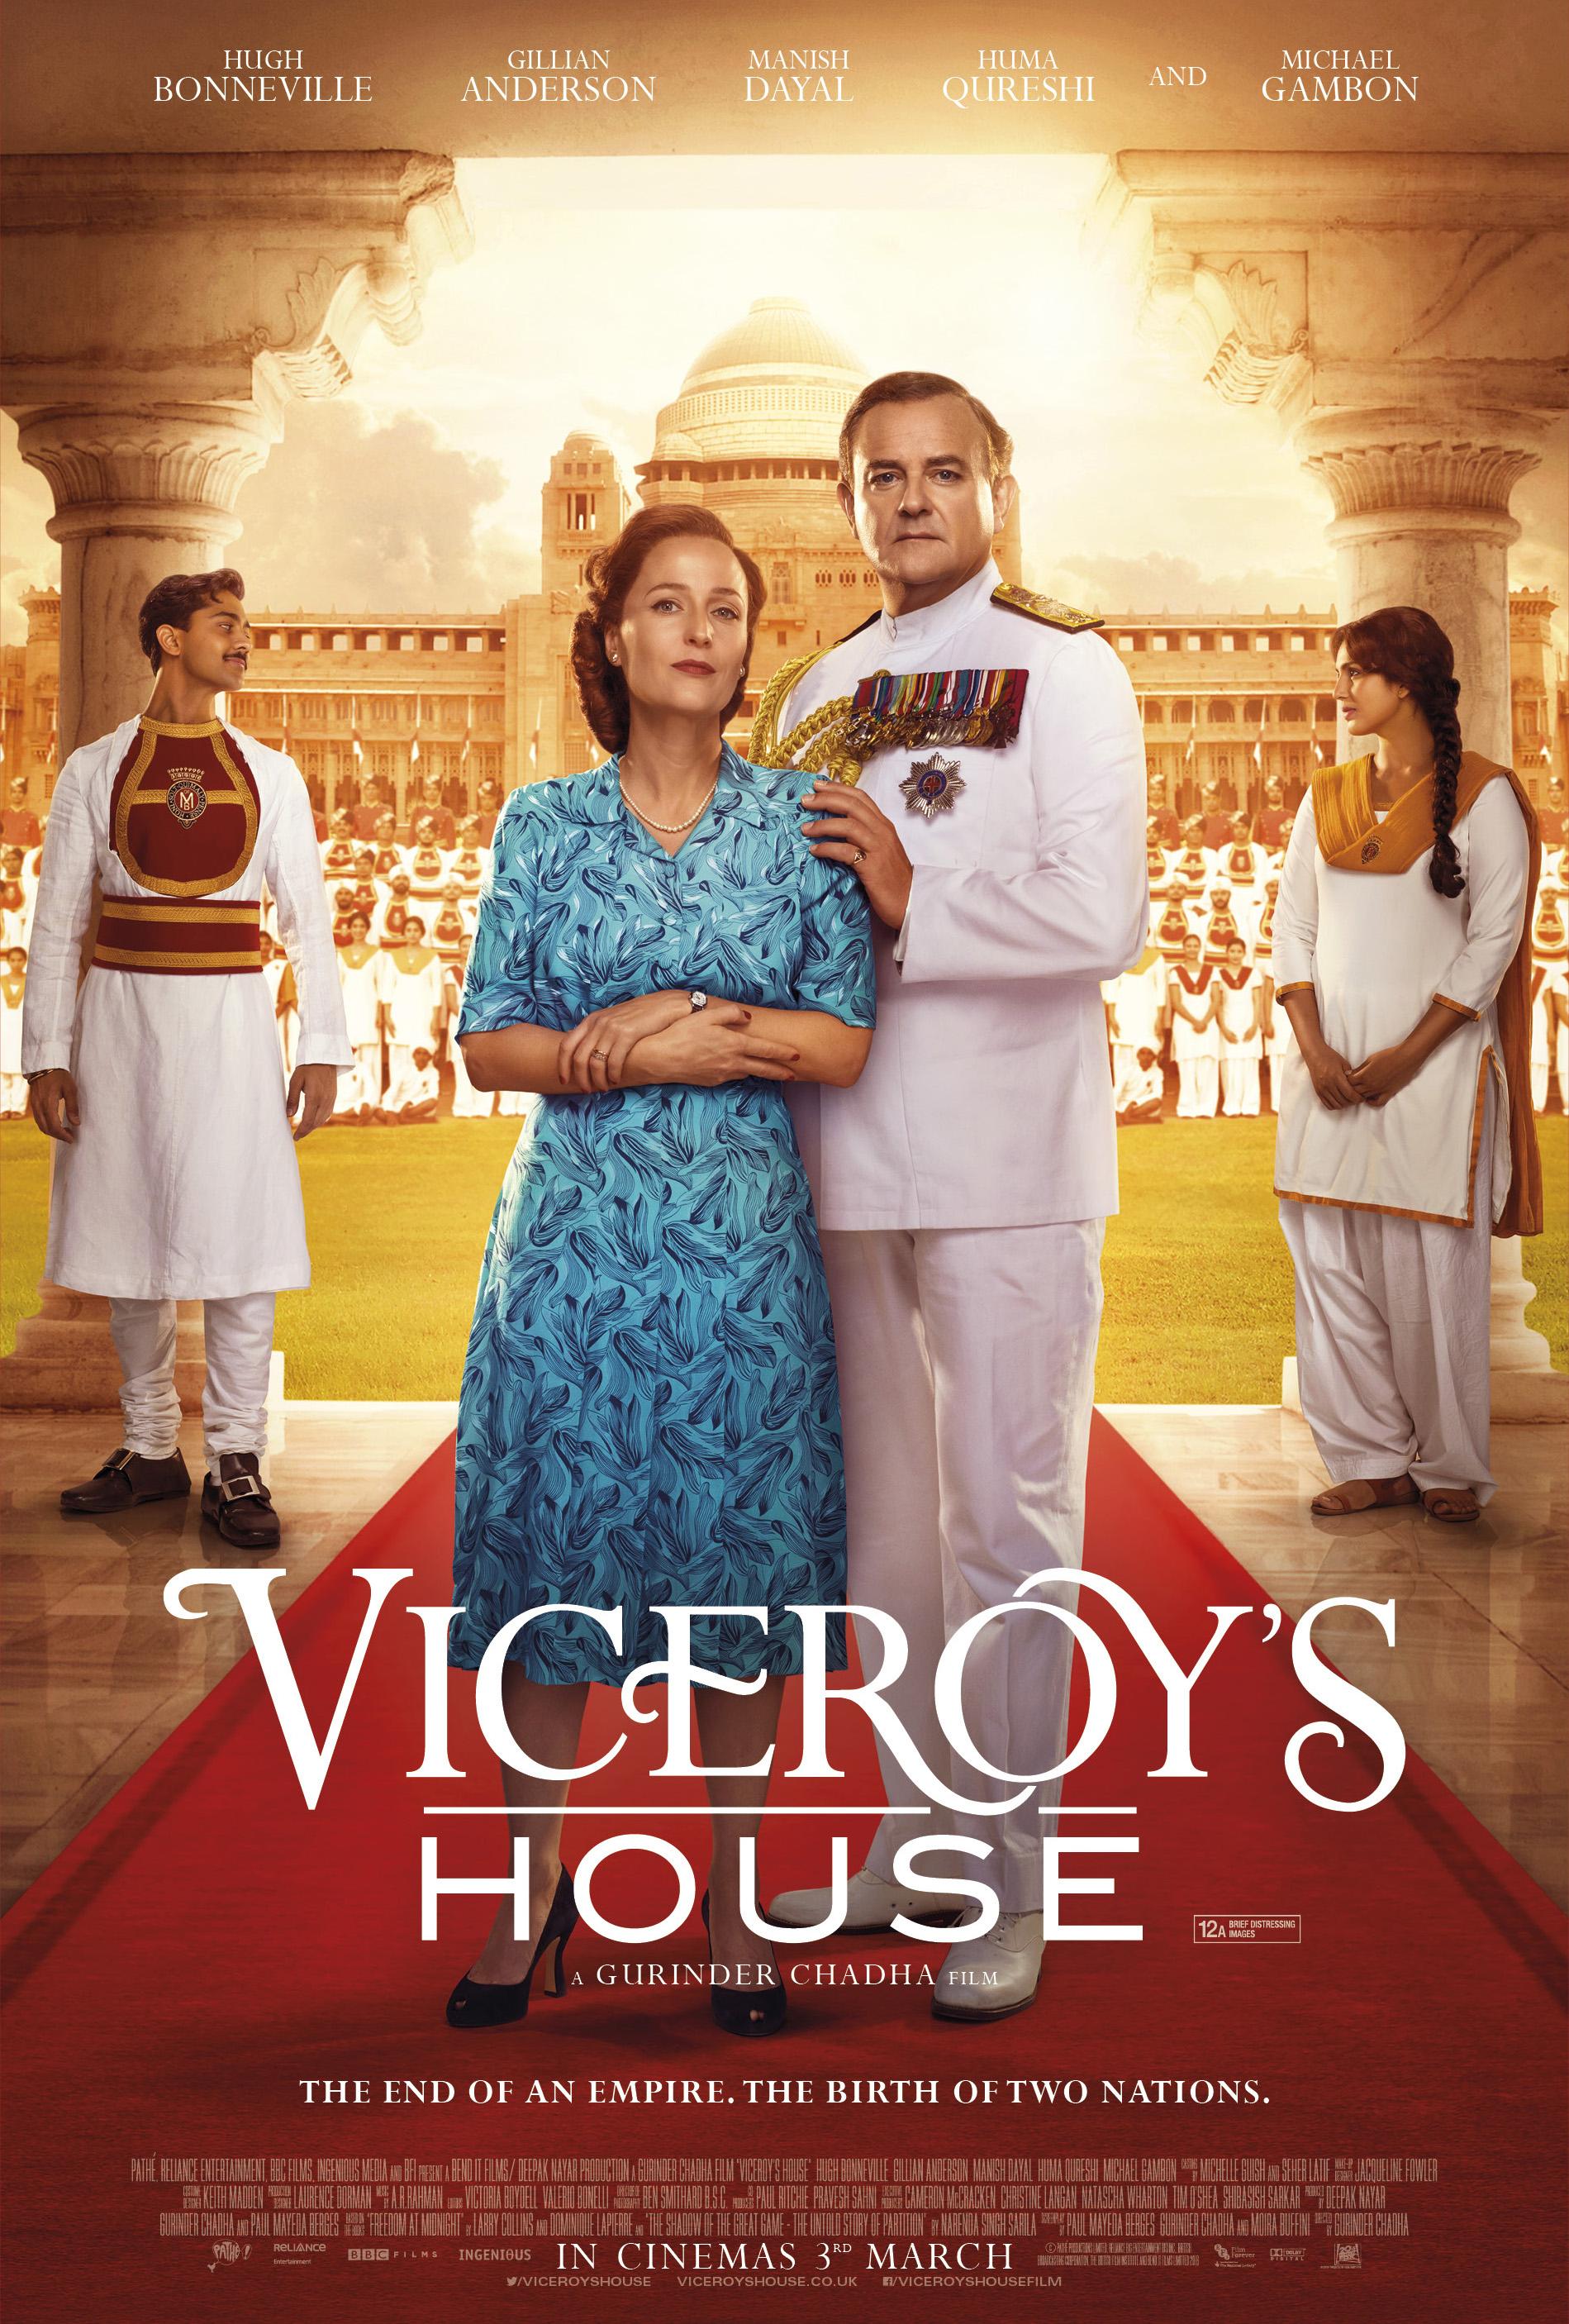 Viceroy's house مشهد من فيلم (6)